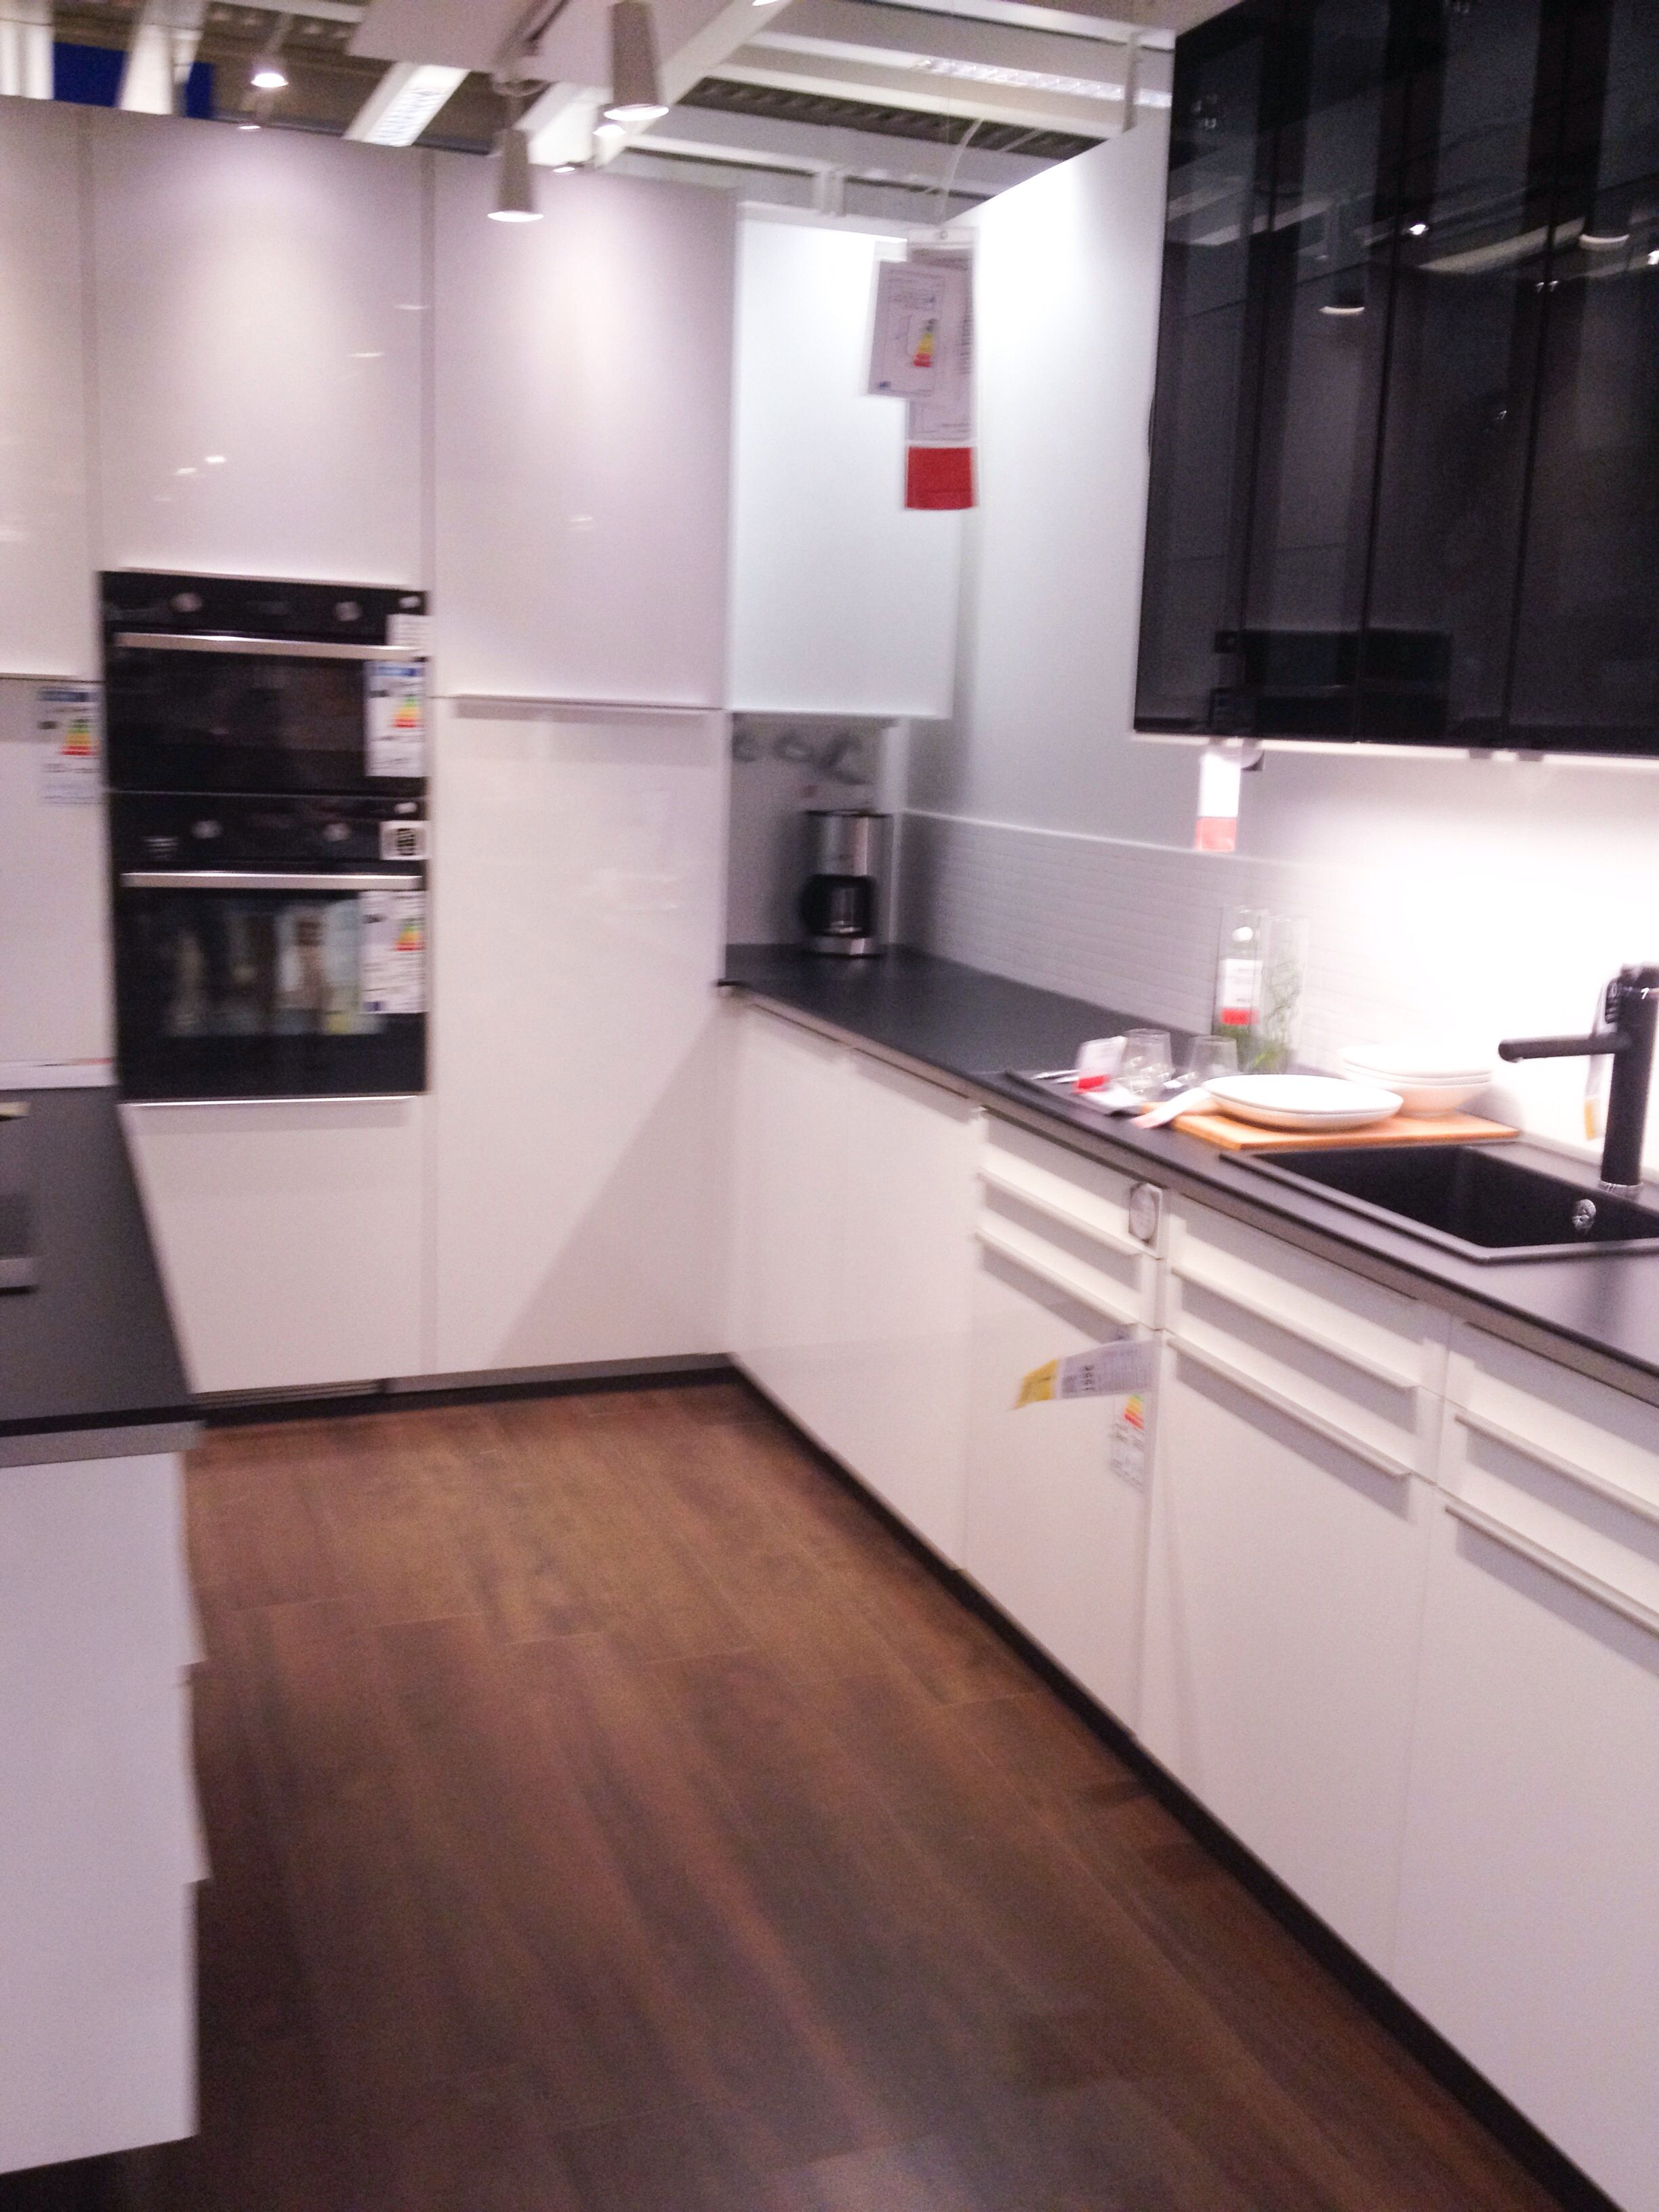 cuisine ringhult ikea montpellier eldh s pinterest id e de cuisine cuisines et relooking. Black Bedroom Furniture Sets. Home Design Ideas